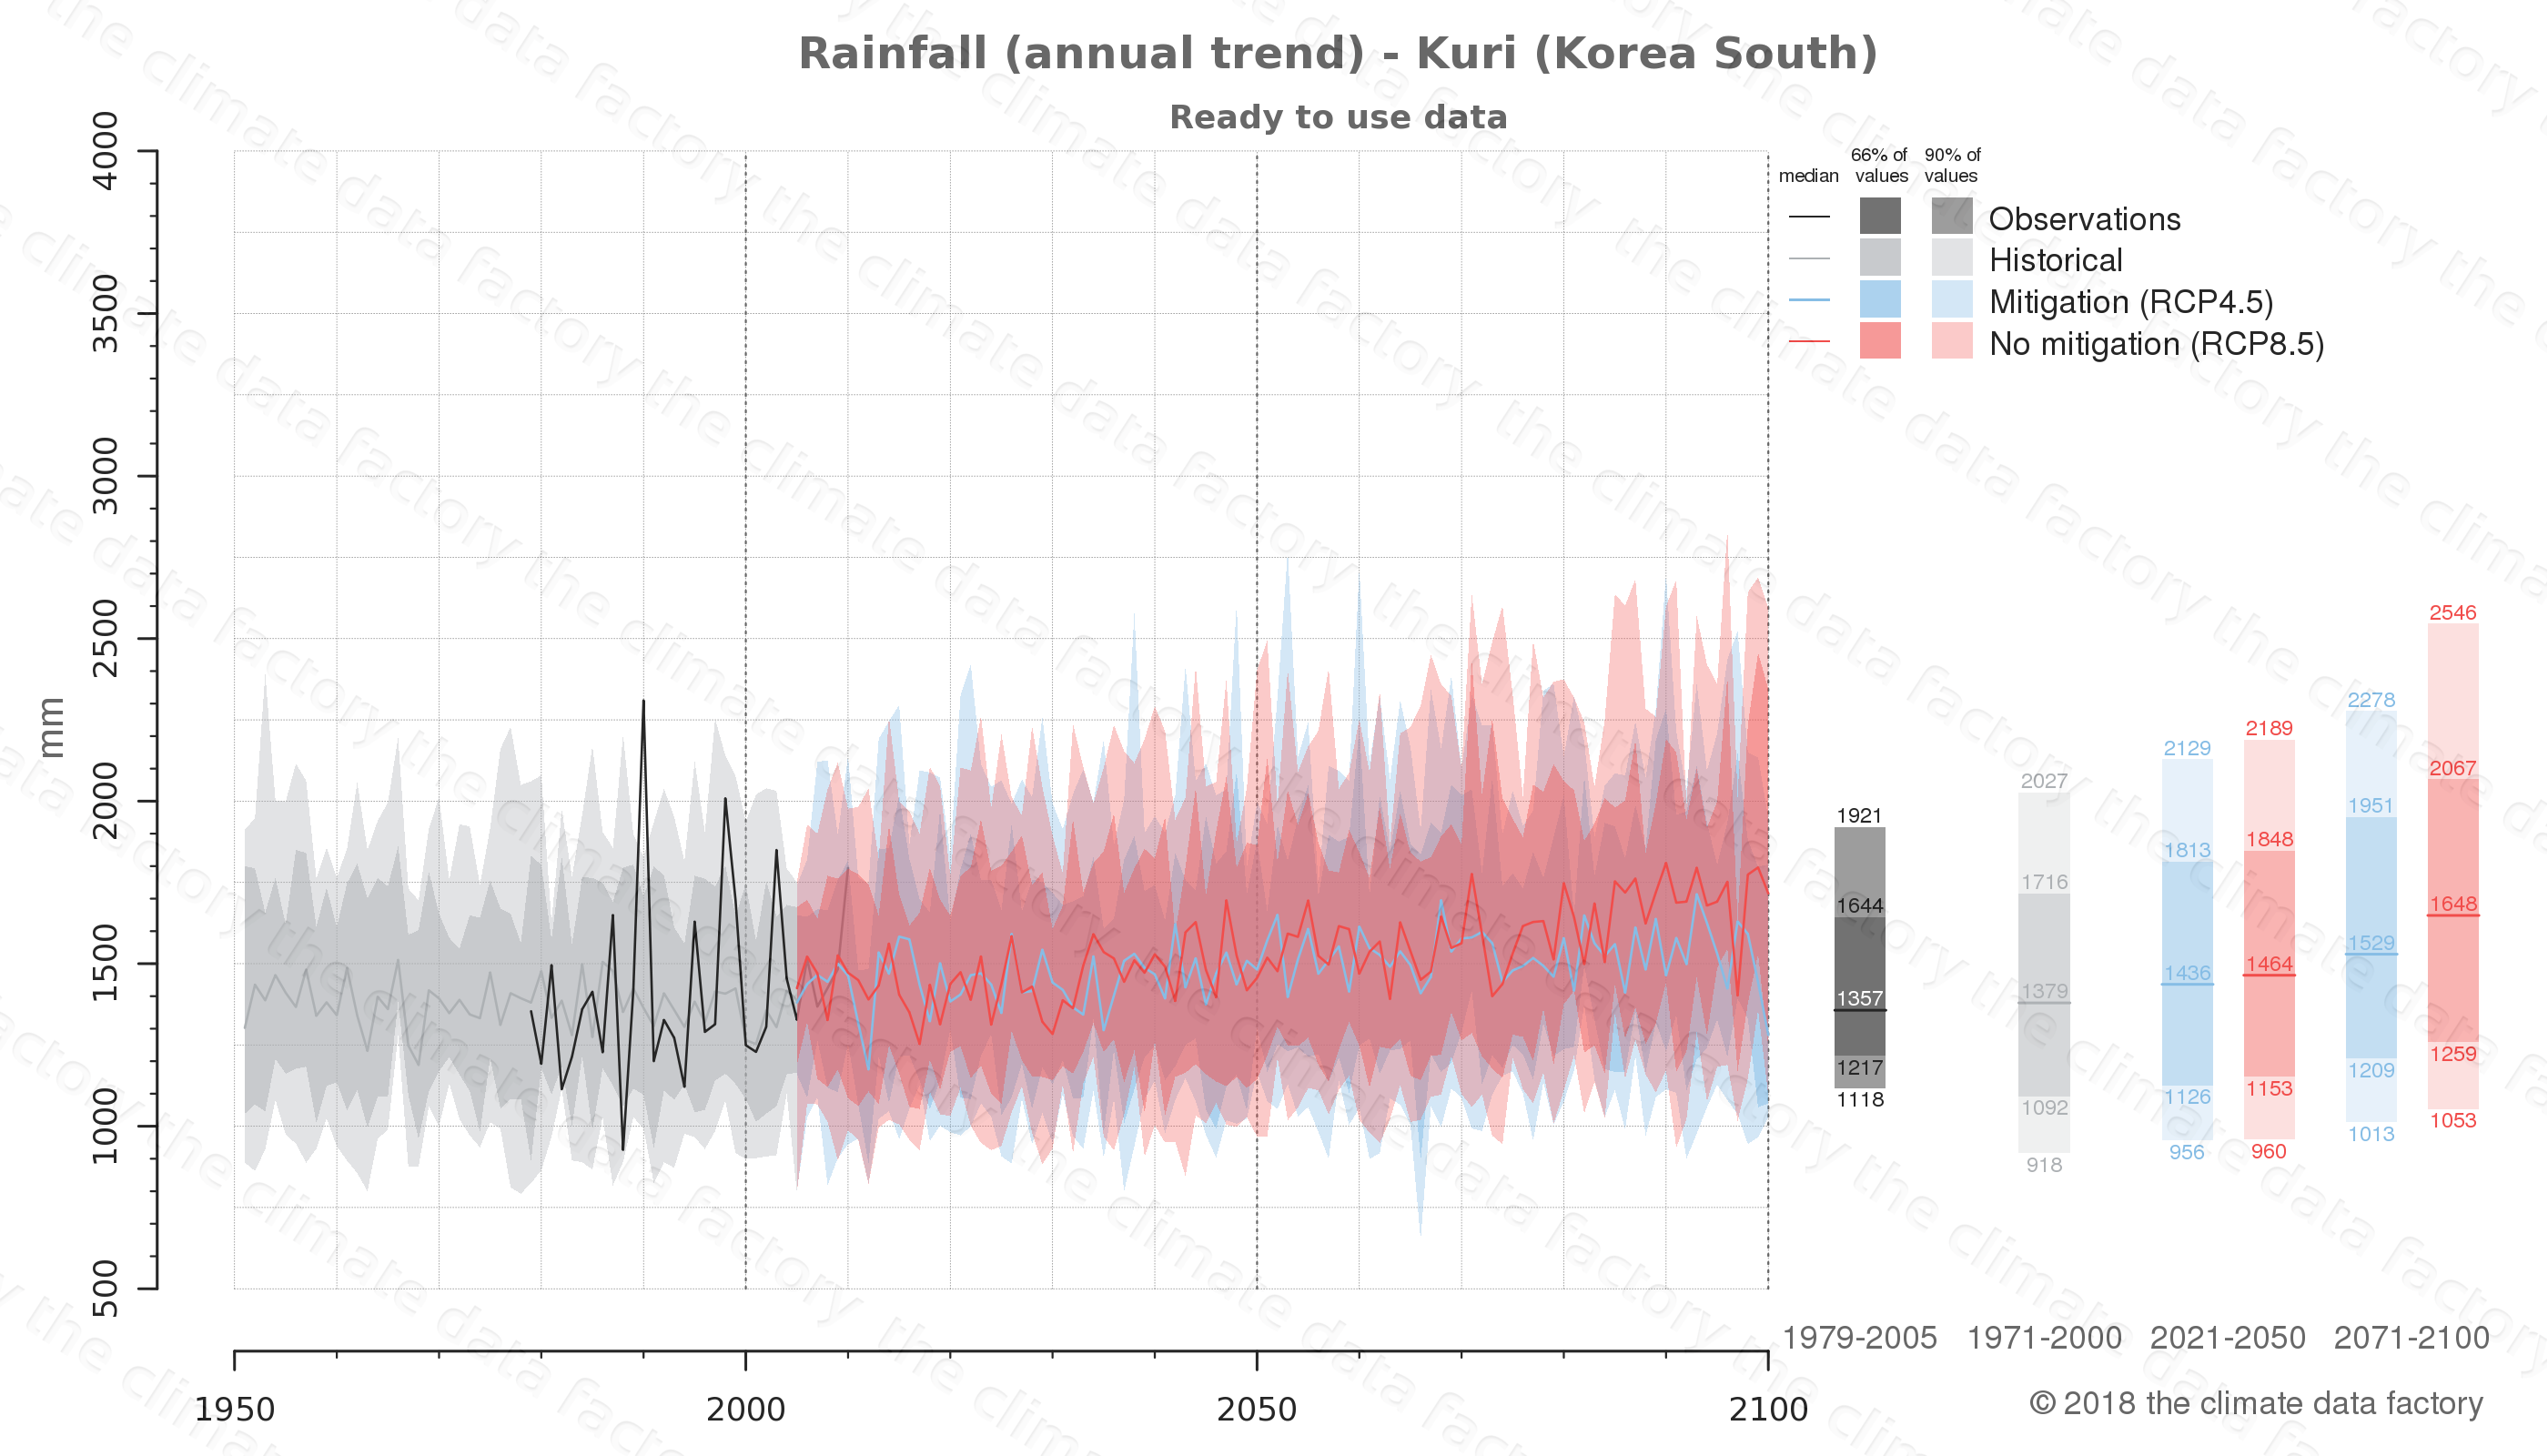 climate change data policy adaptation climate graph city data rainfall kuri south korea